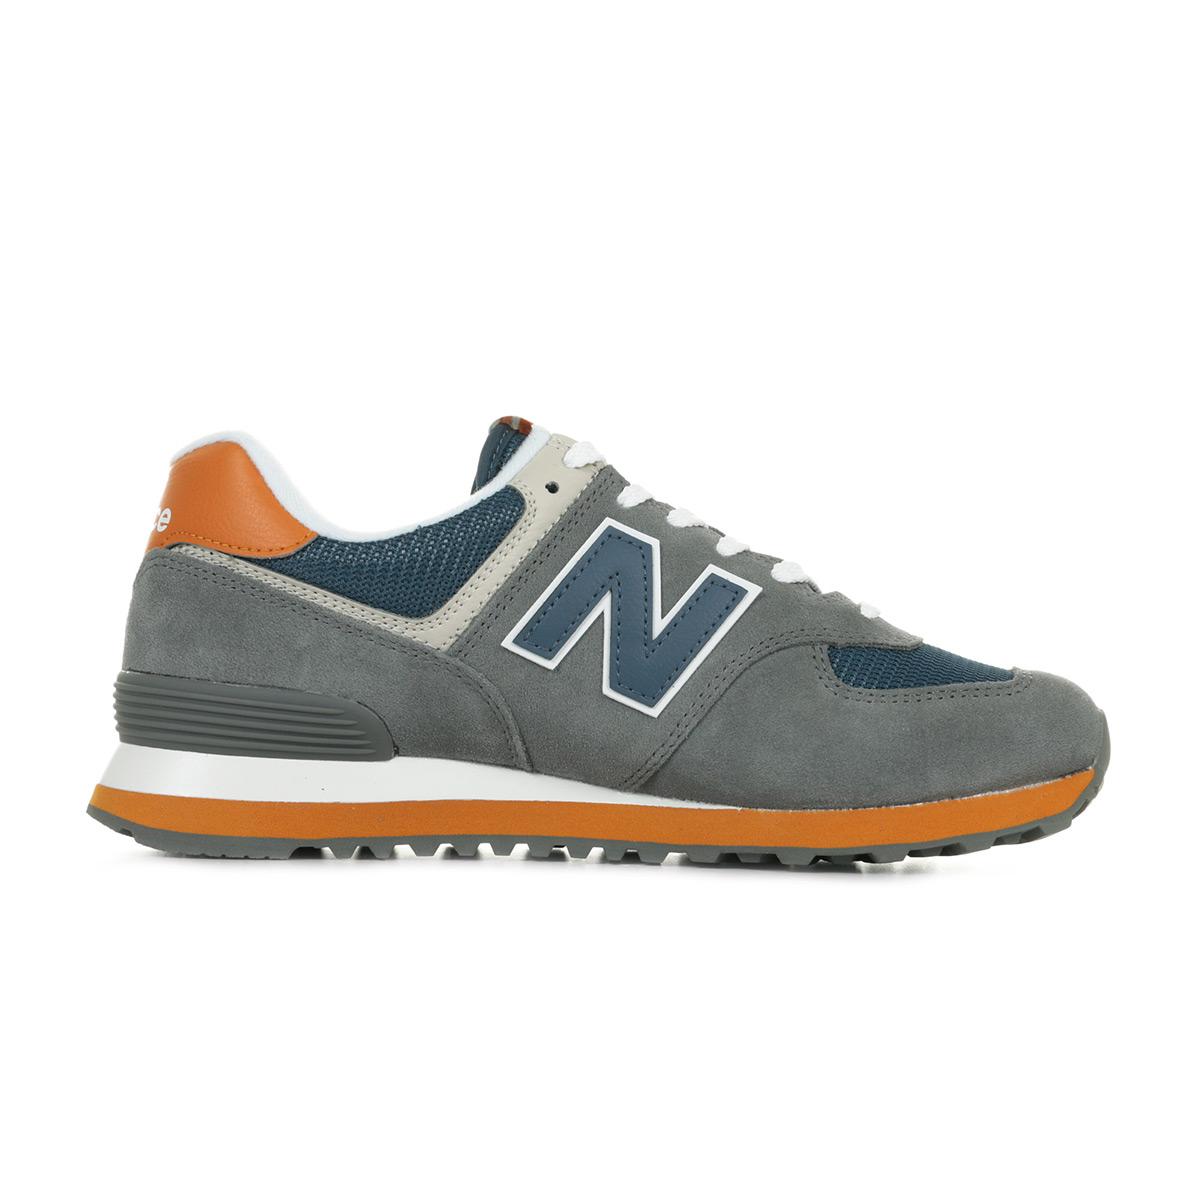 new style 01487 ddc82 ... New Balance 574 MUC ...